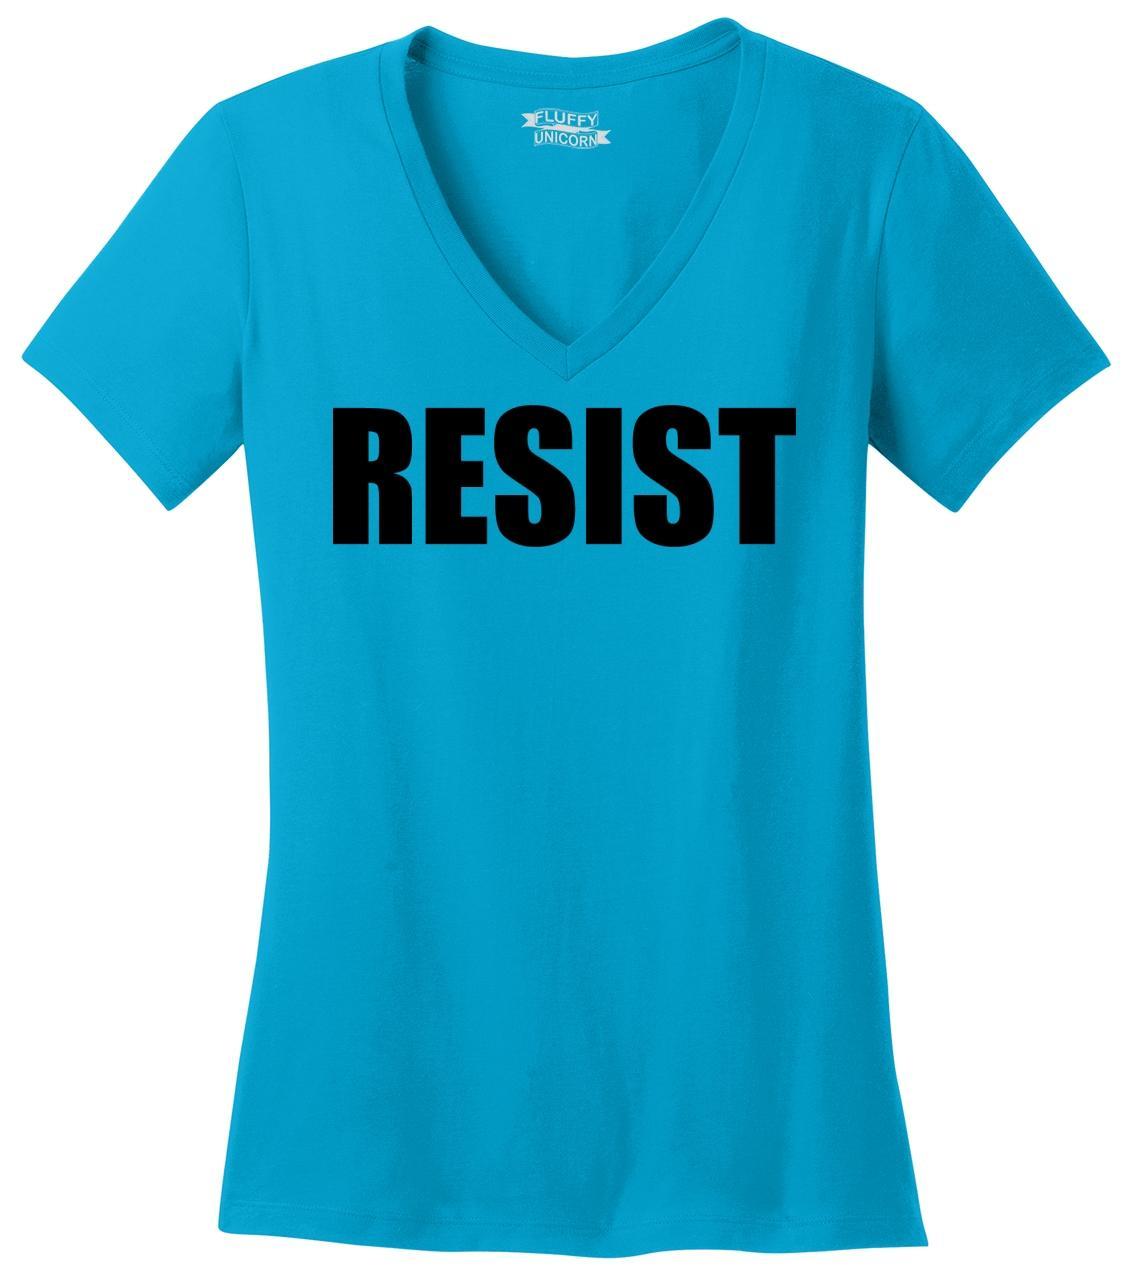 thumbnail 13 - Resist-Ladies-V-Neck-T-Shirt-Anti-Donald-Trump-Protest-Tee-Rally-Resist-Trump-Z5